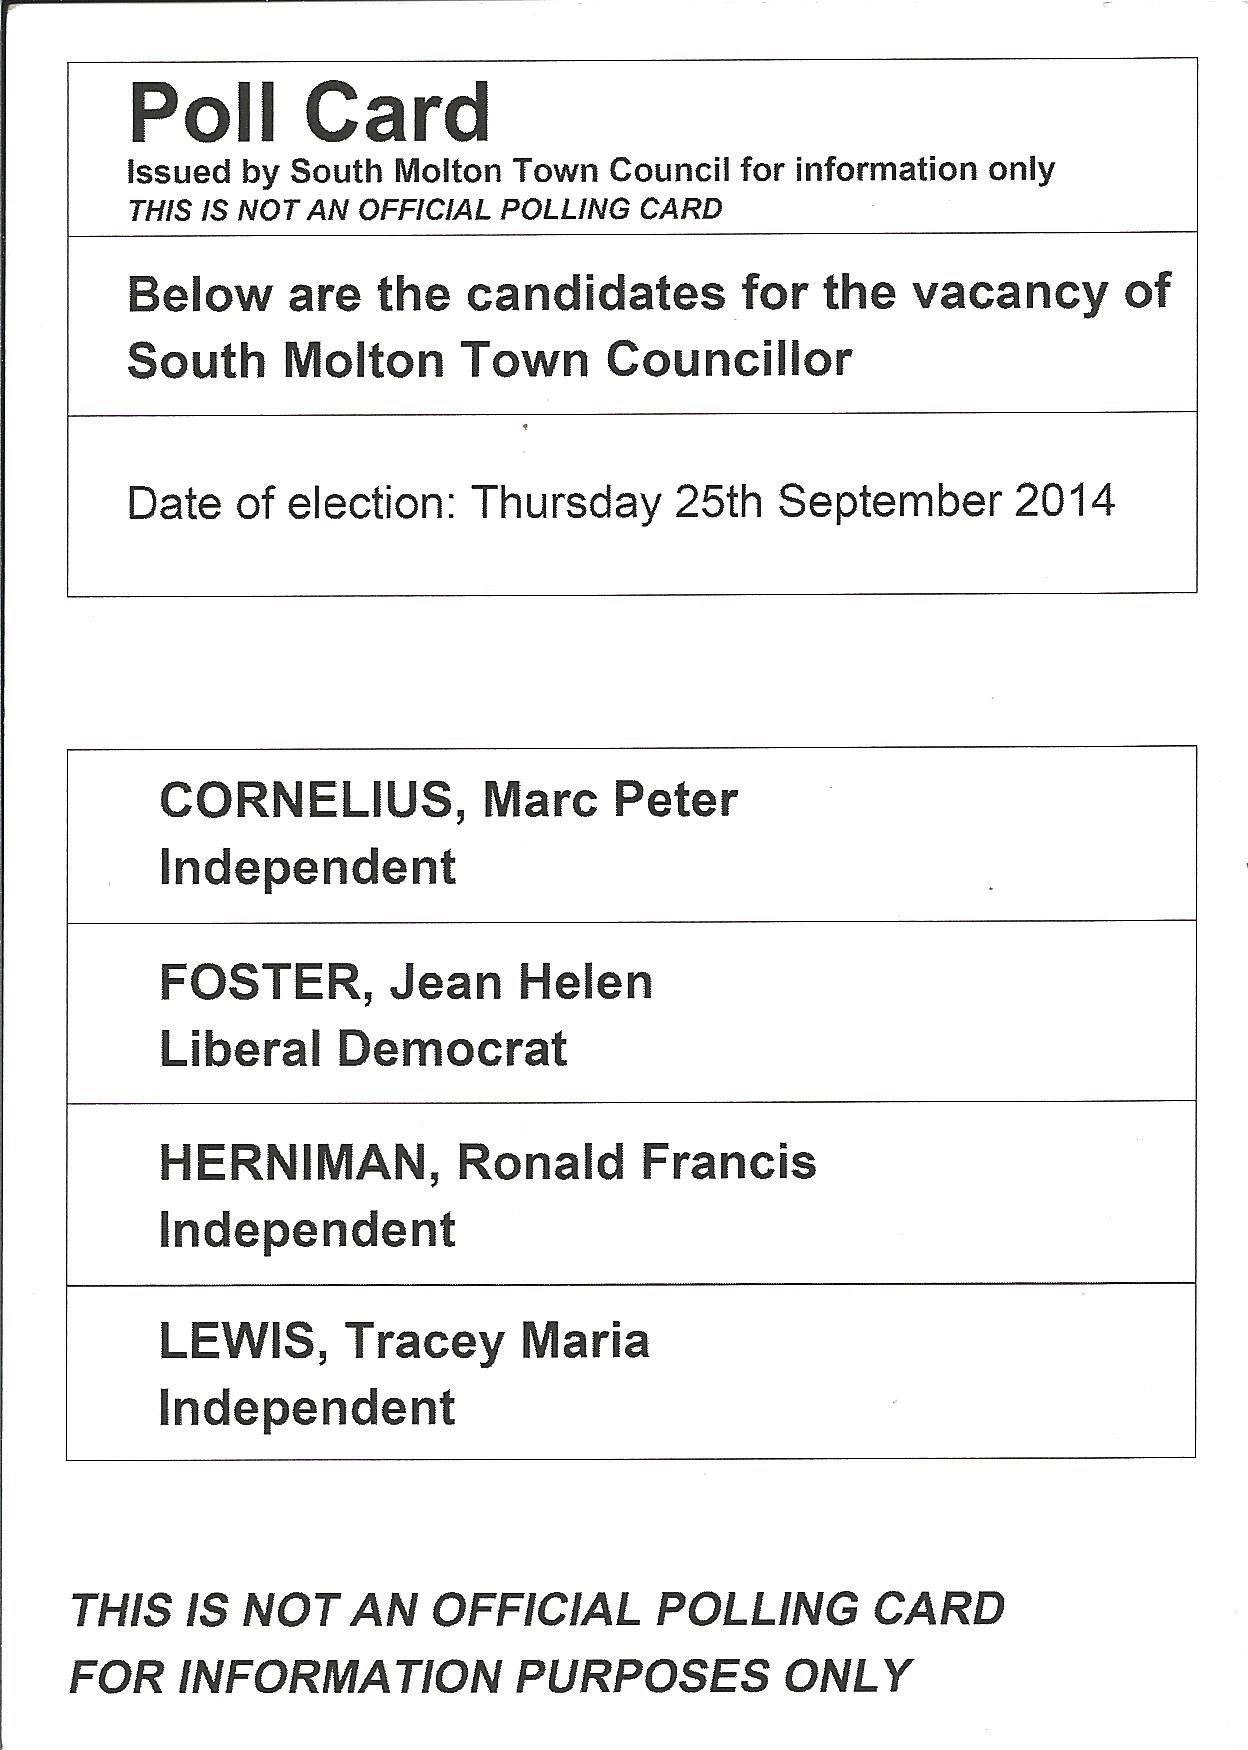 Poll Card Side 2